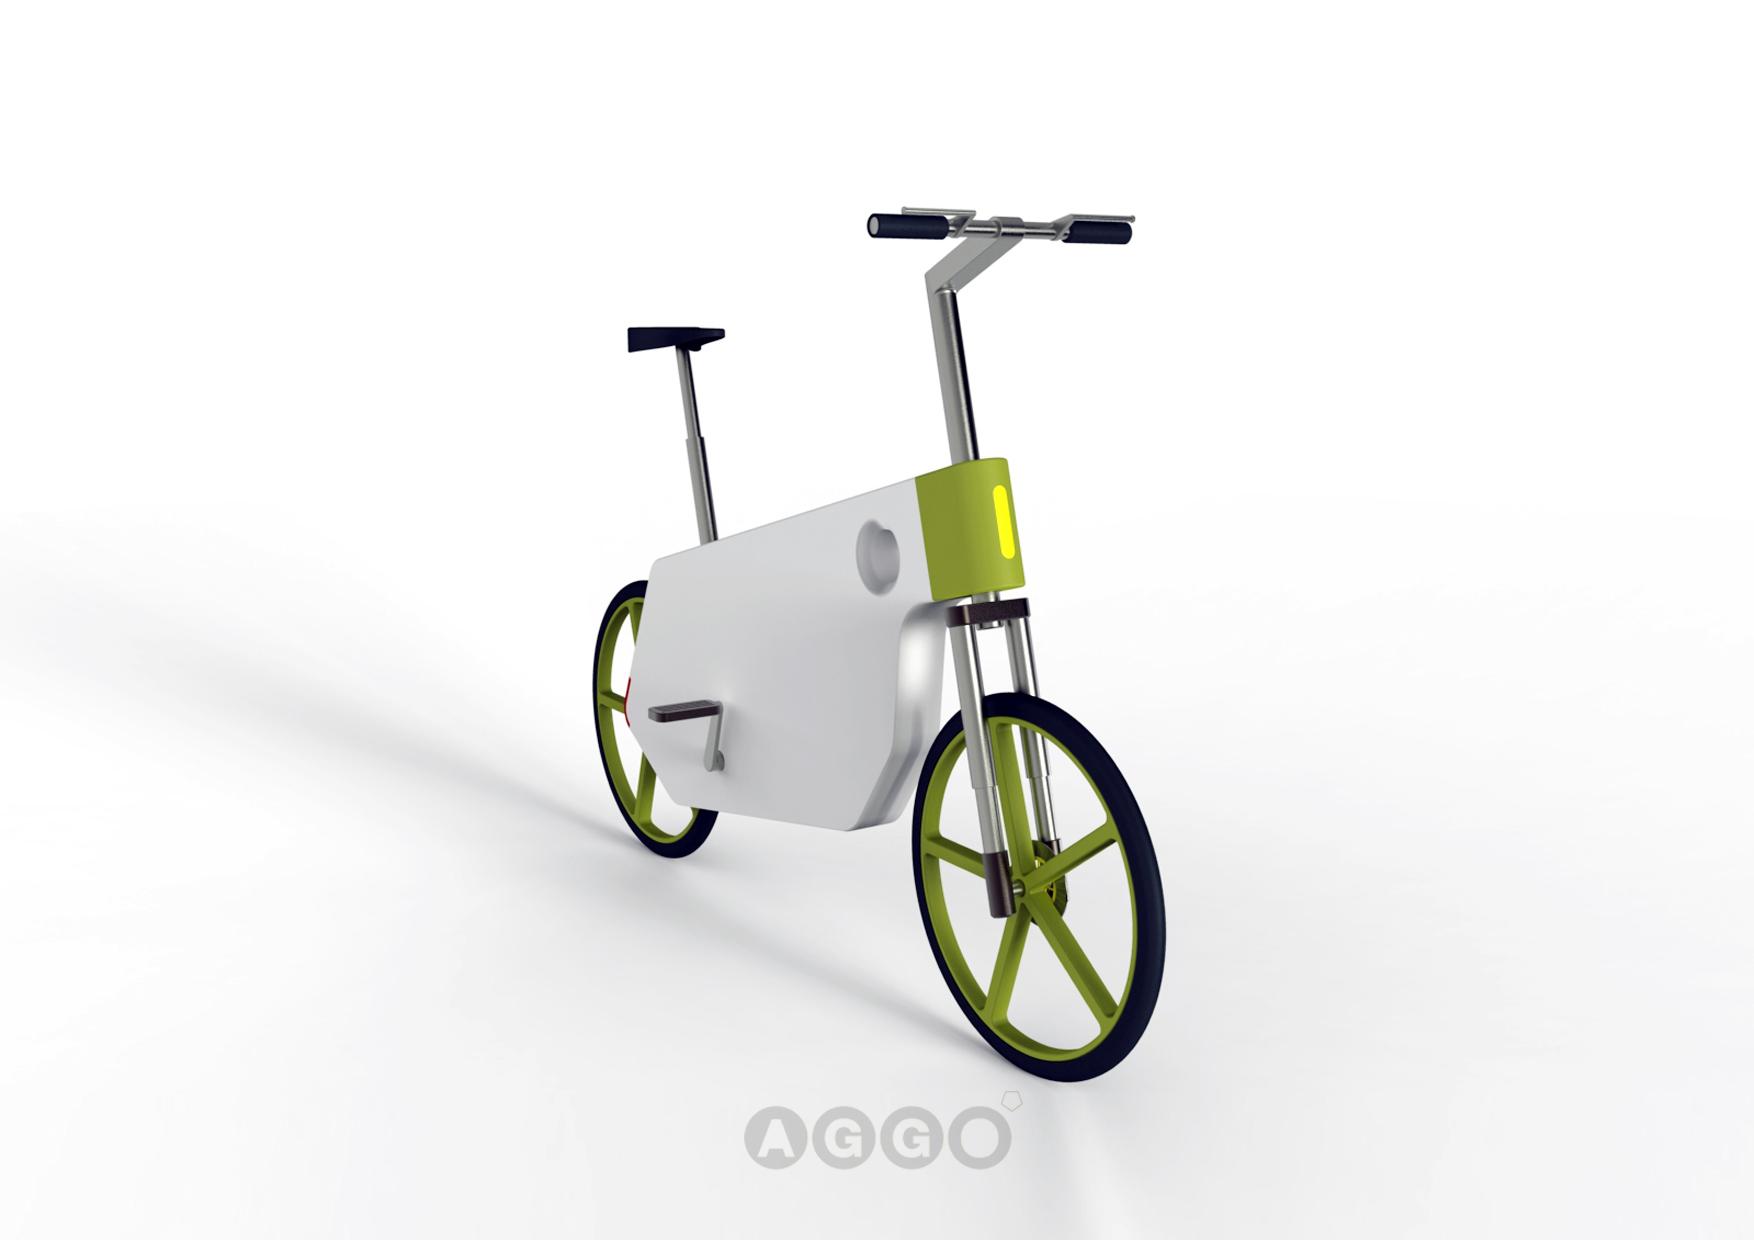 aggo_tesla_bike001.jpg